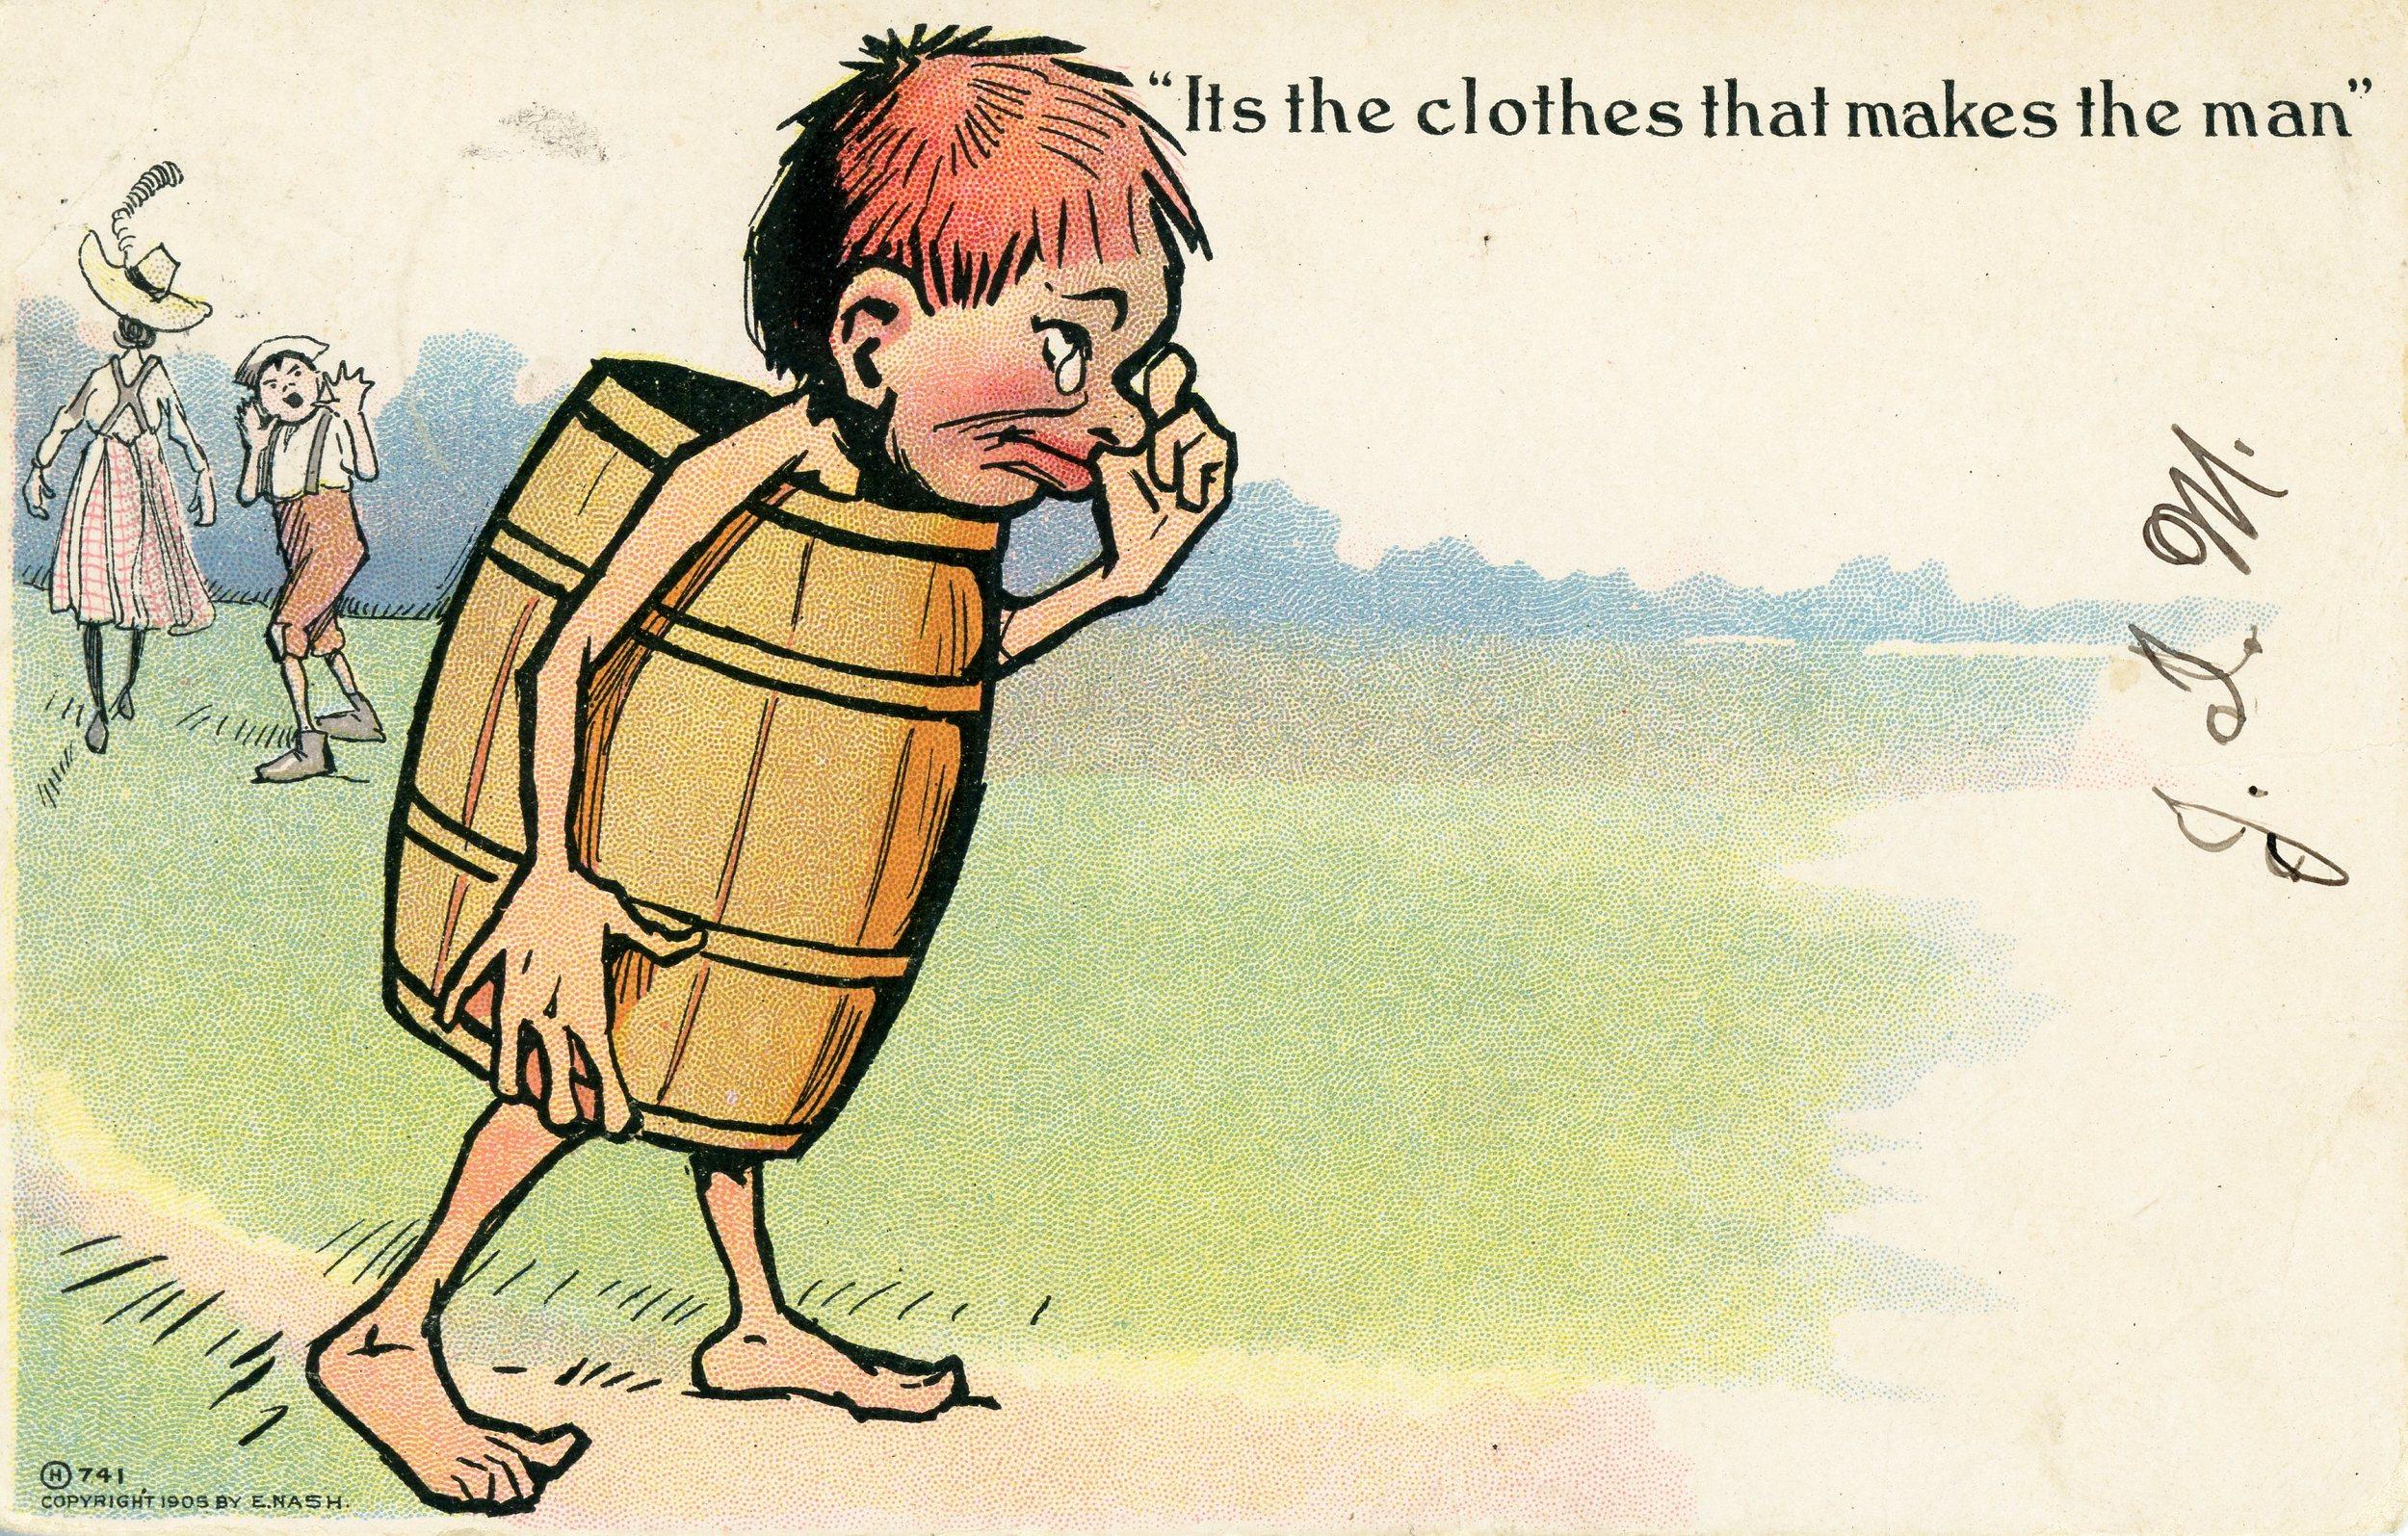 clothes_make_the_man